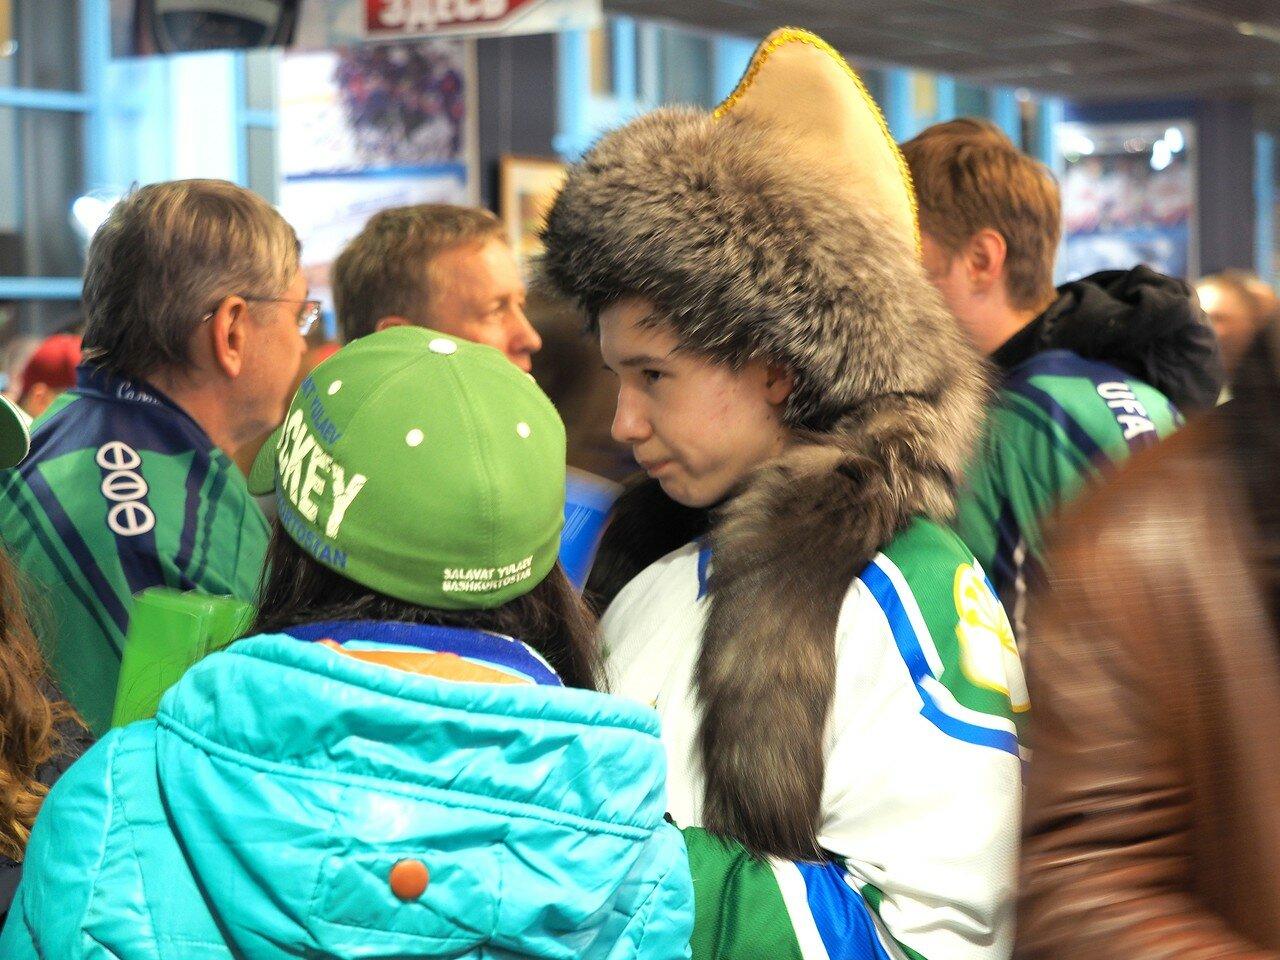 111Плей-офф 2016 Восток Финал Металлург - Салават Юлаев 23.03.2016